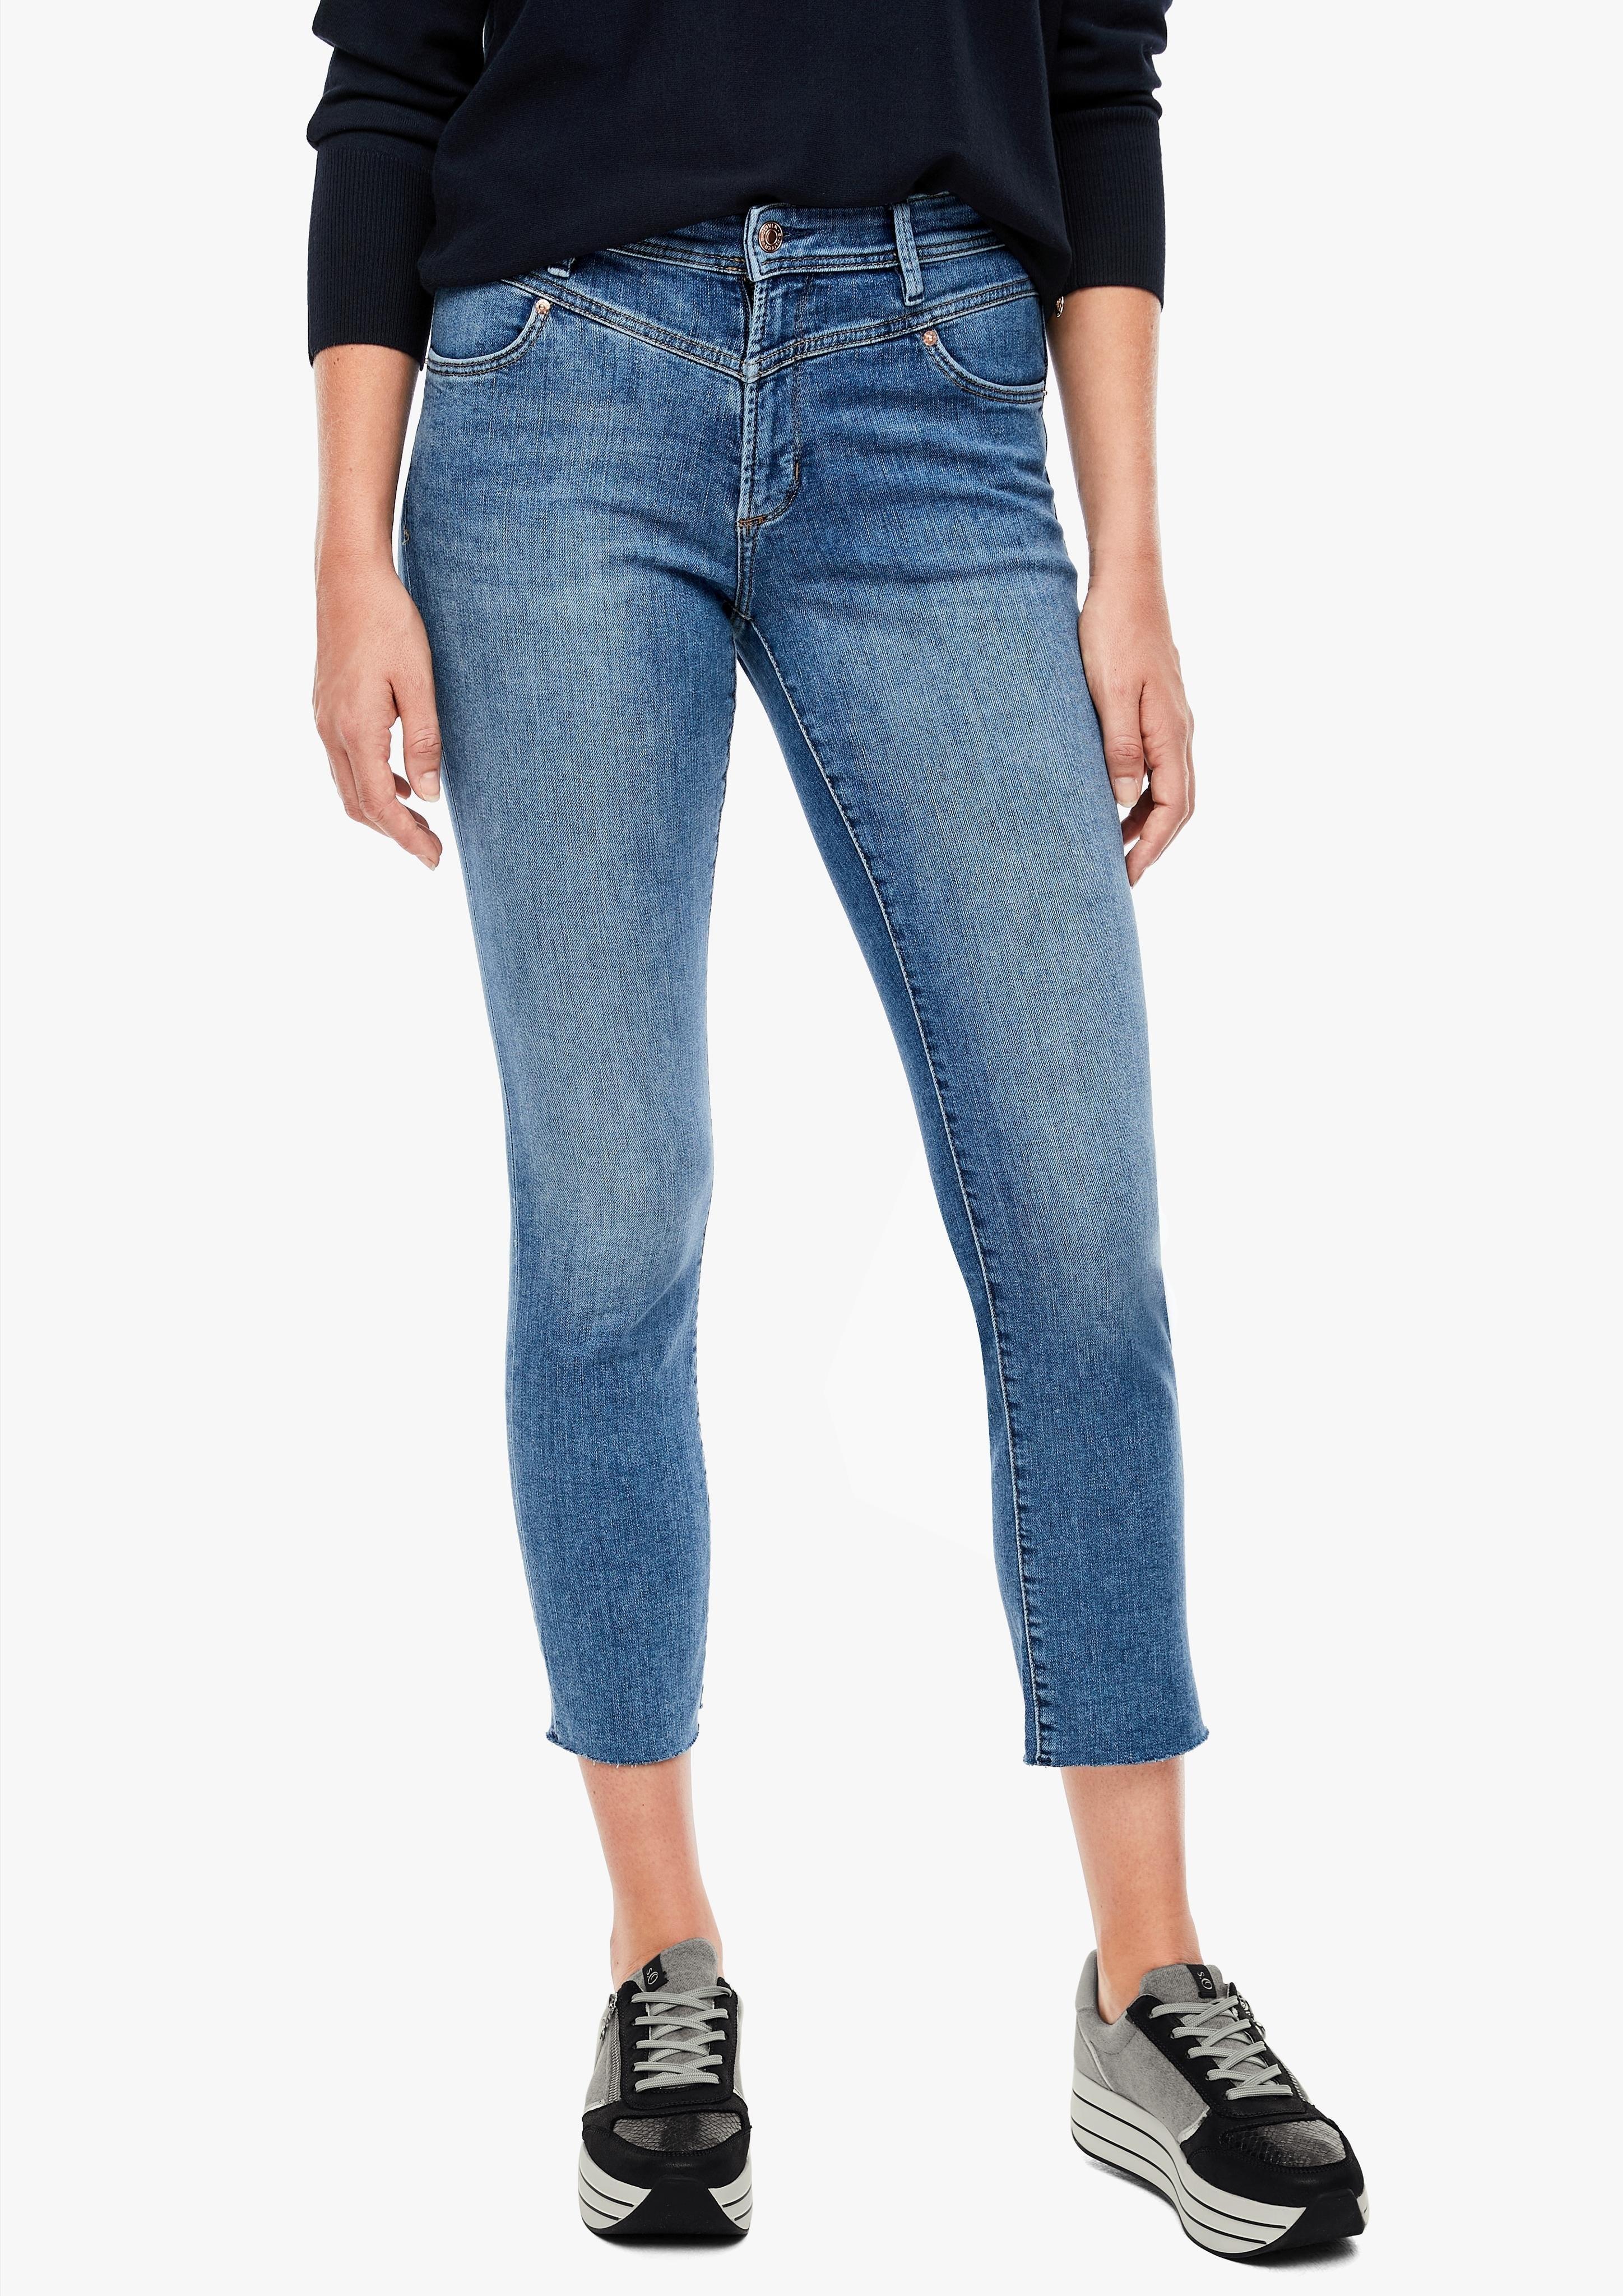 s.Oliver RED LABEL s.Oliver 7/8 jeans in de webshop van OTTO kopen